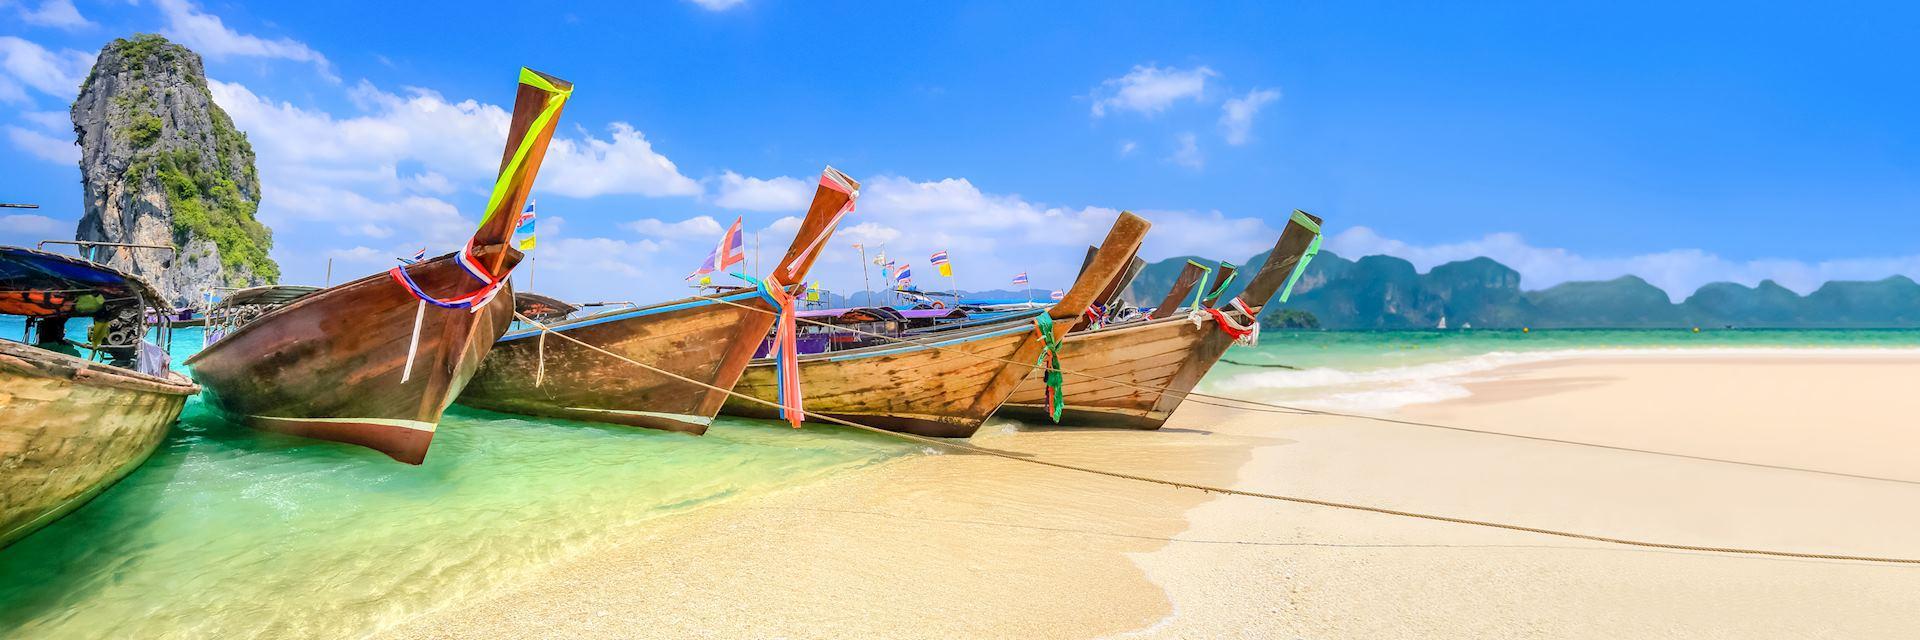 Longtail boats in Krabi, Thailand